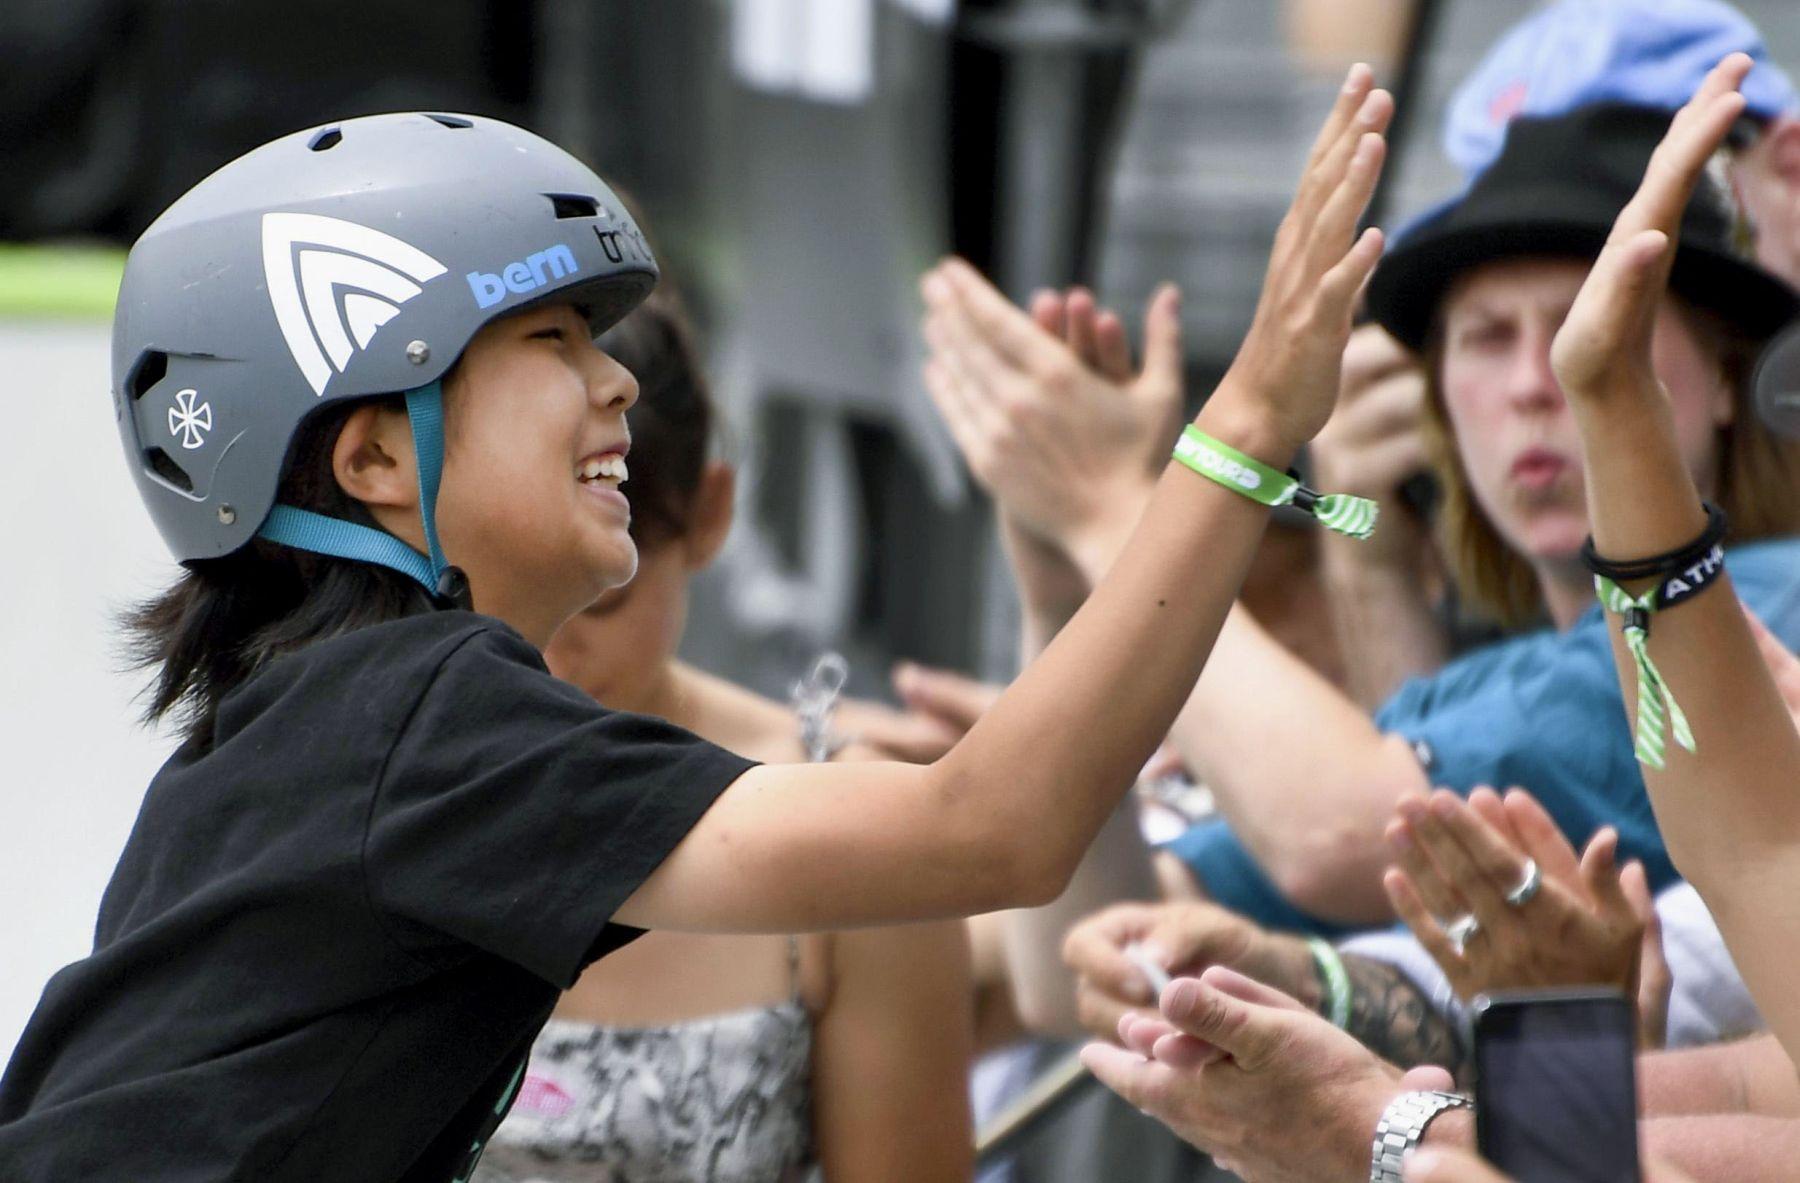 Misugu Okamoto Japan Wins in the Womens Park Skateboard Final 009